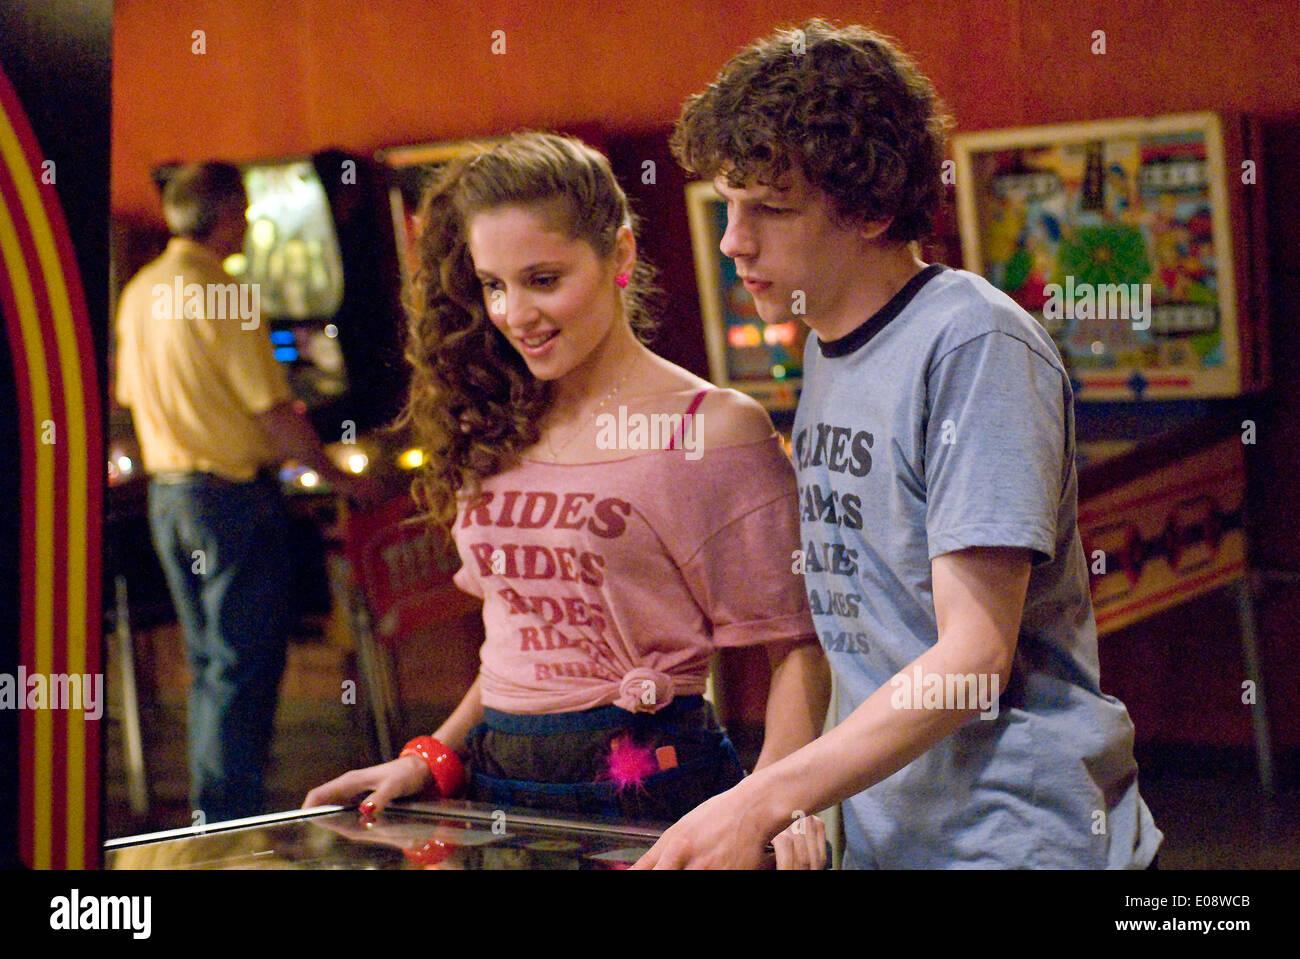 Adventureland 2009 Margarita Levieva Jesse Eisenberg Greg Mottola Dir Moviestore Sammlung Ltd Stockfotografie Alamy